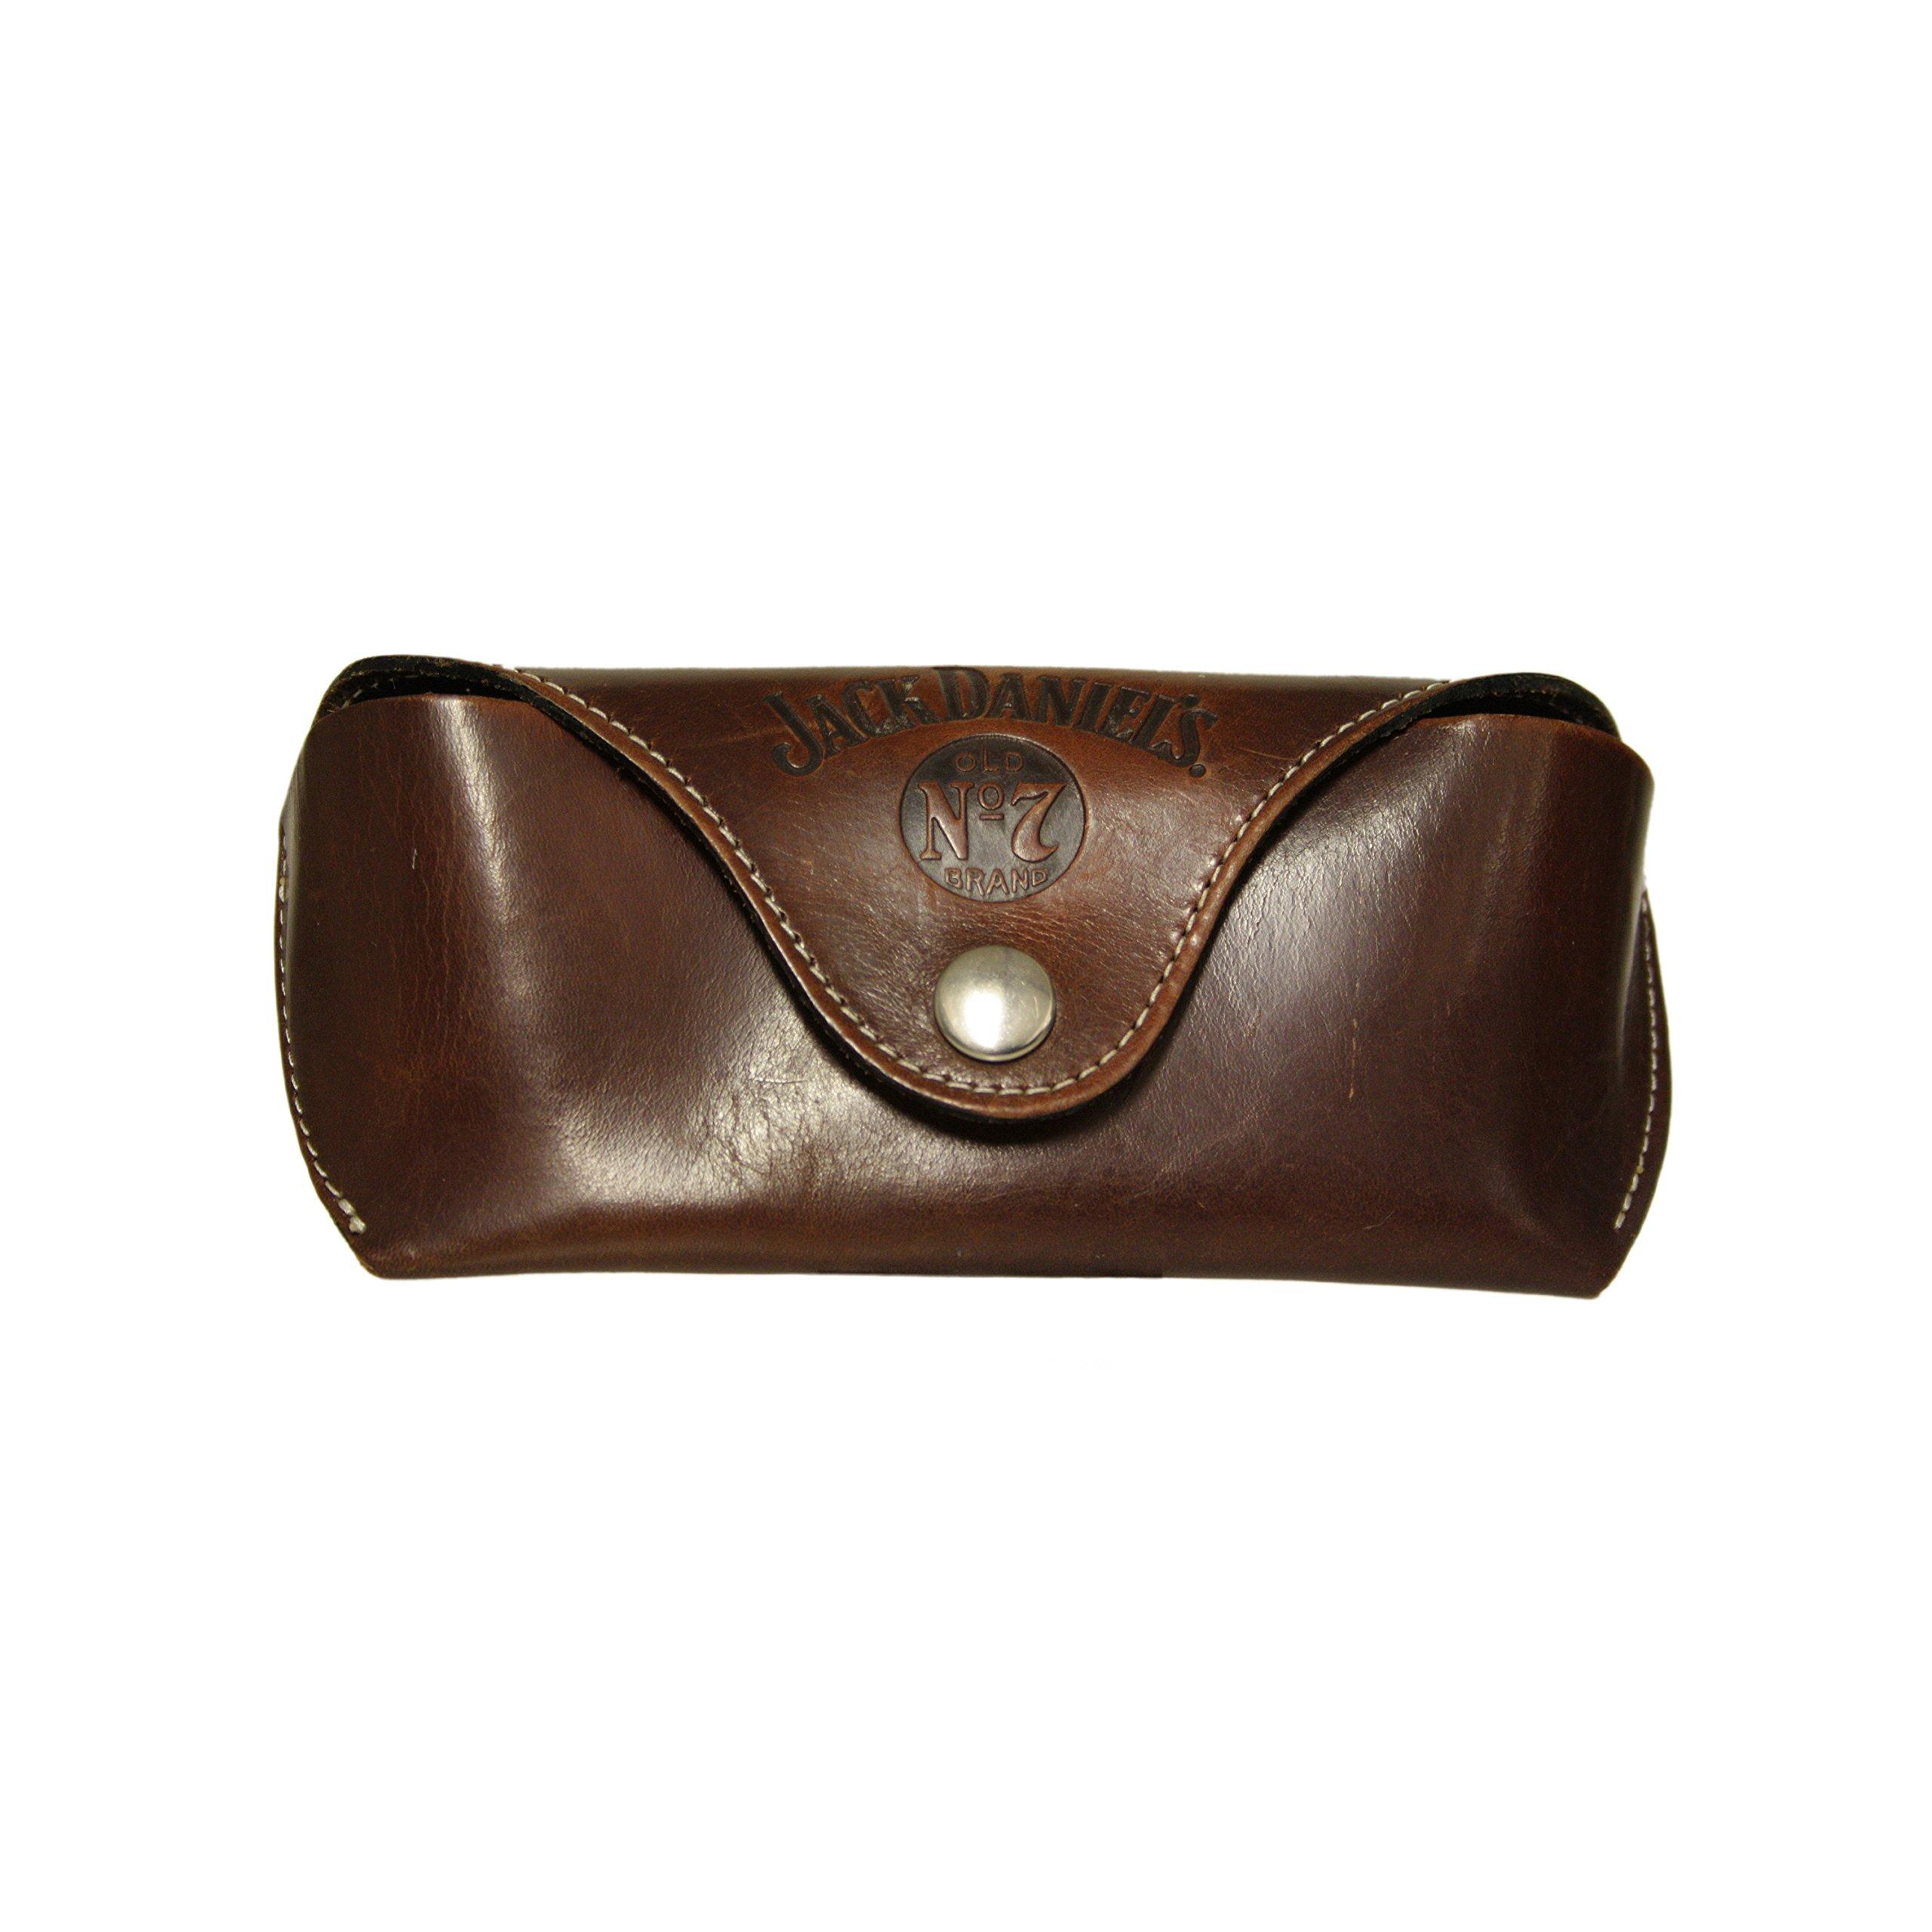 Jack Daniel's Western leather glasses case with belt loop